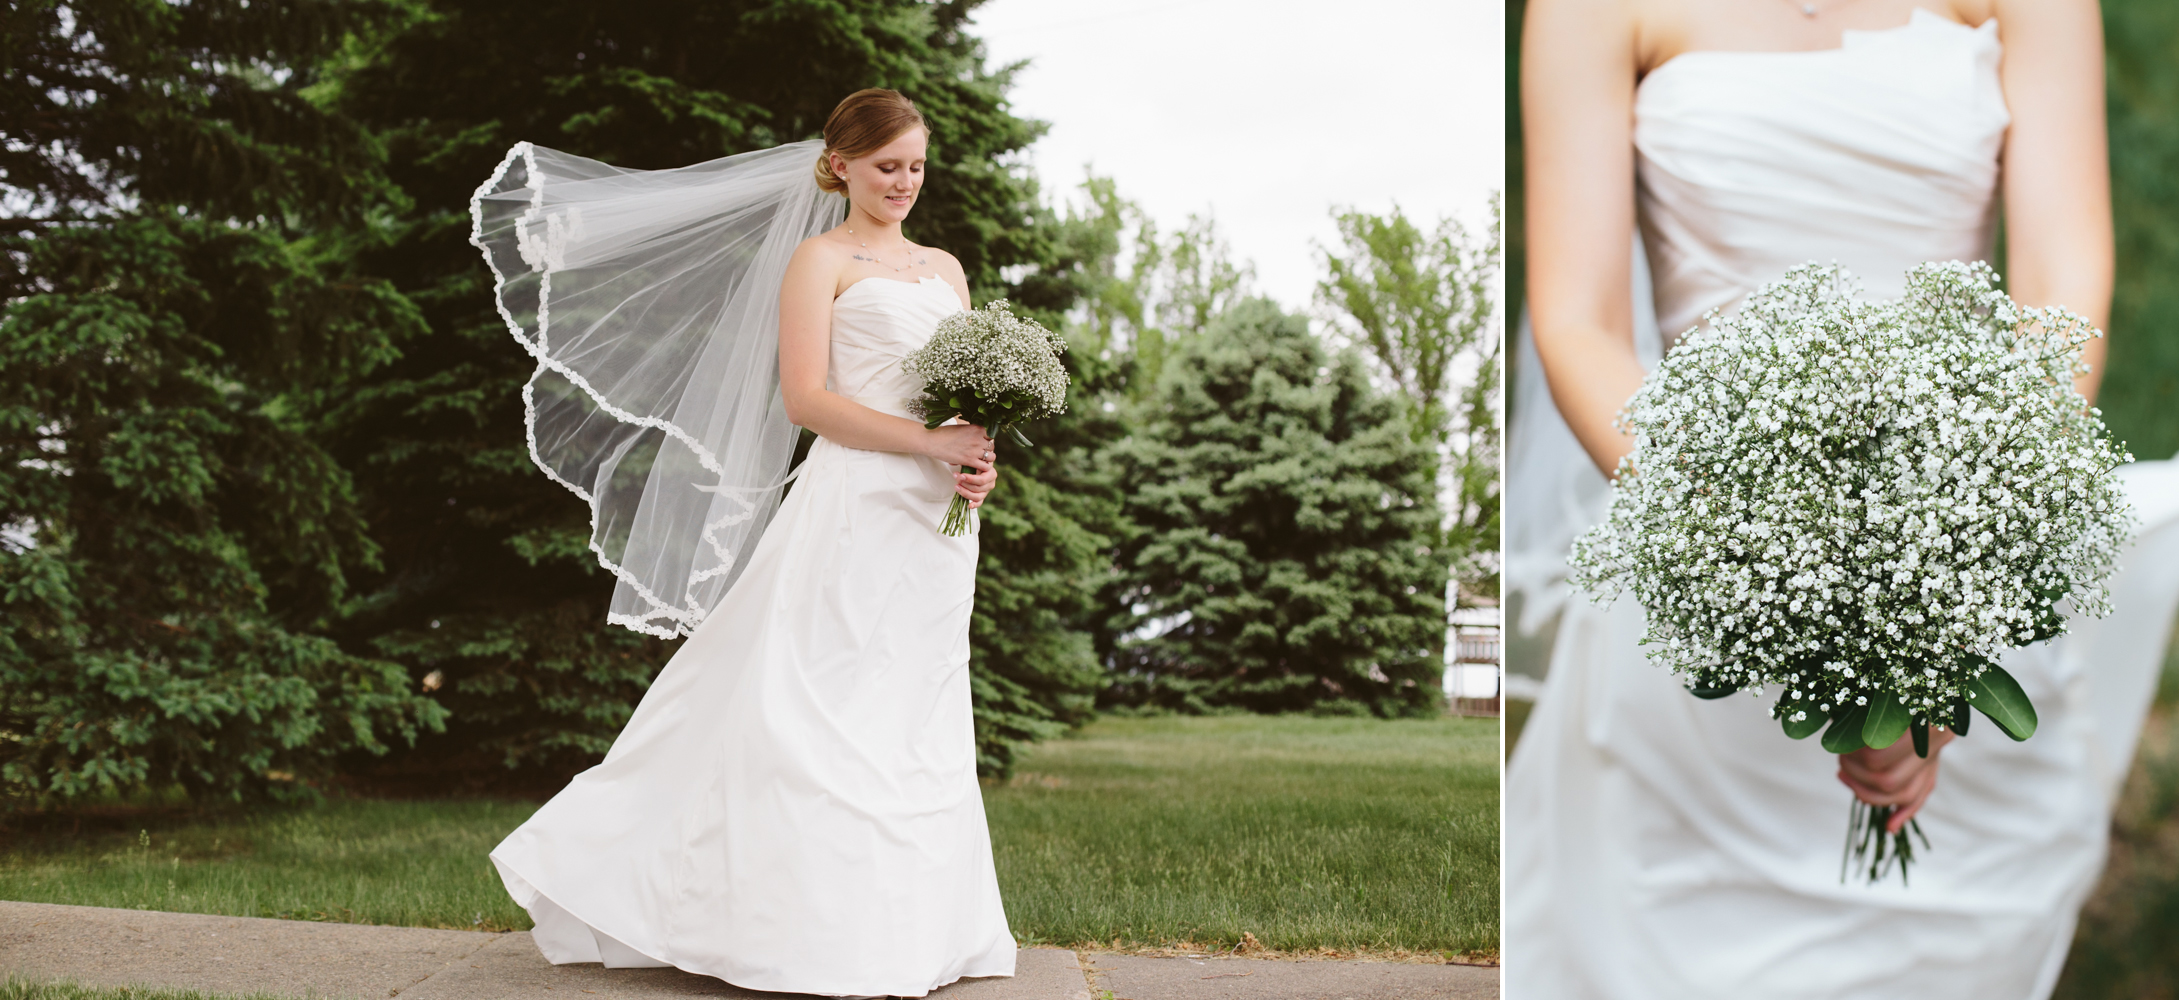 South-Dakota-Intimate-Wedding-7.jpg